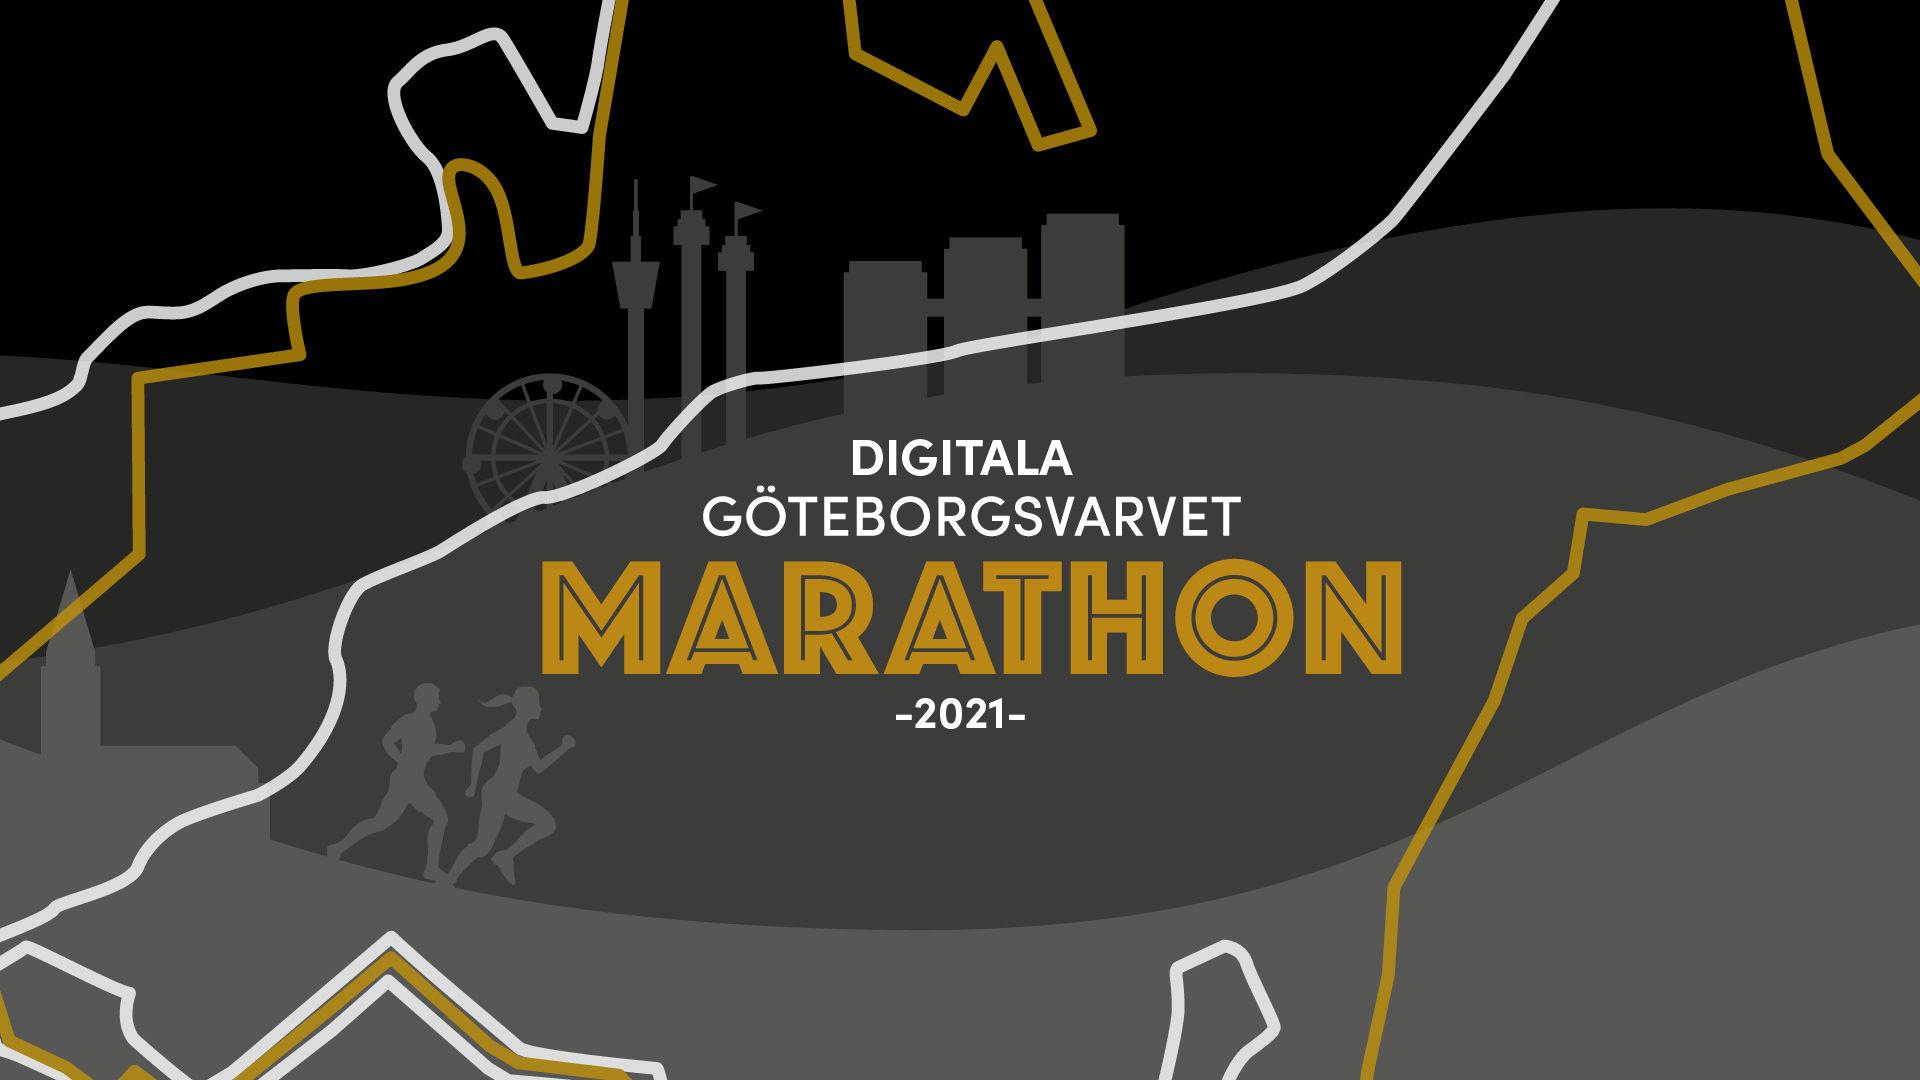 Digitala Göteborgsvarvet Marathon 2021